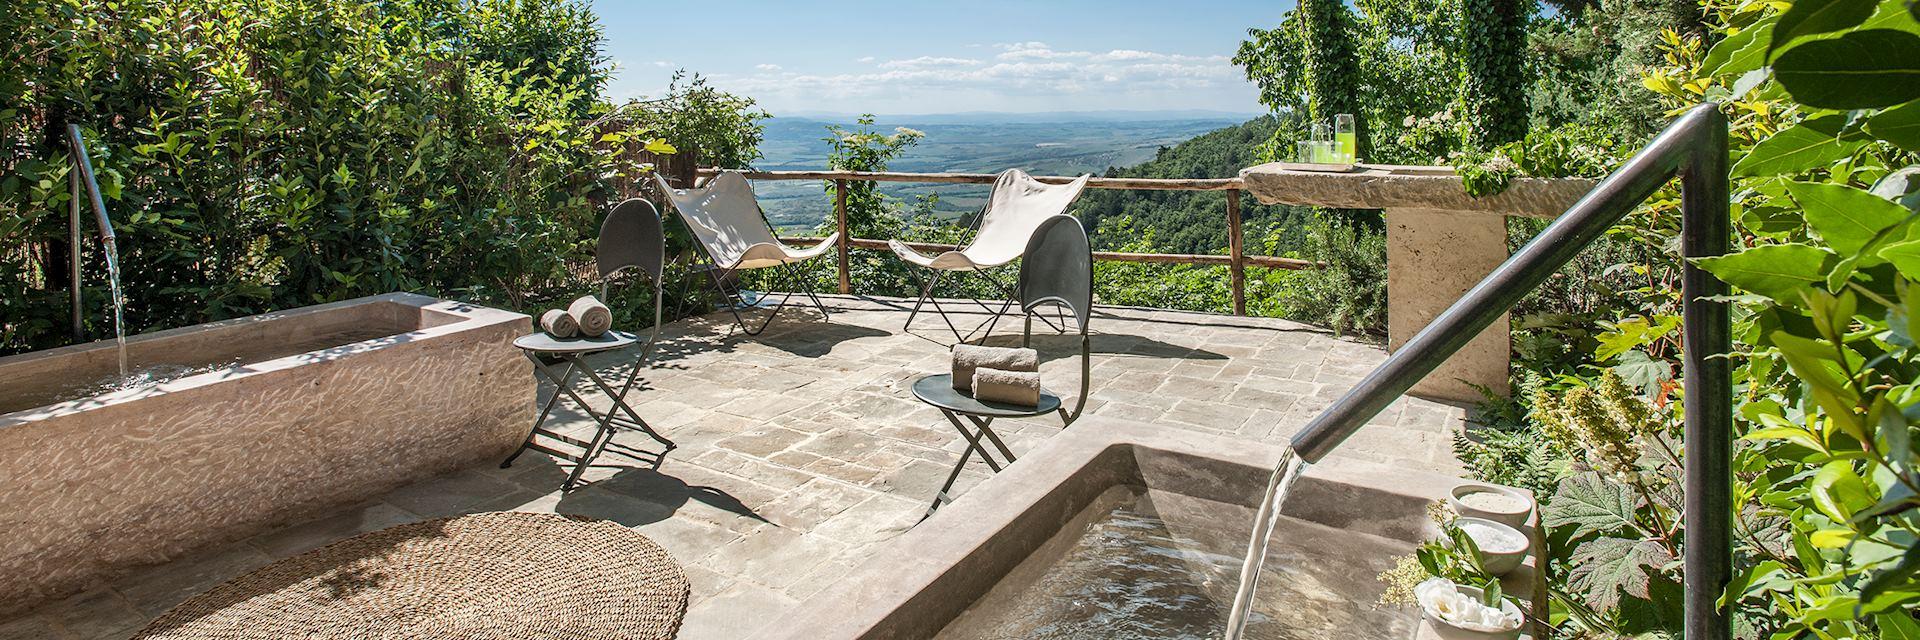 Monteverdi, Tuscany